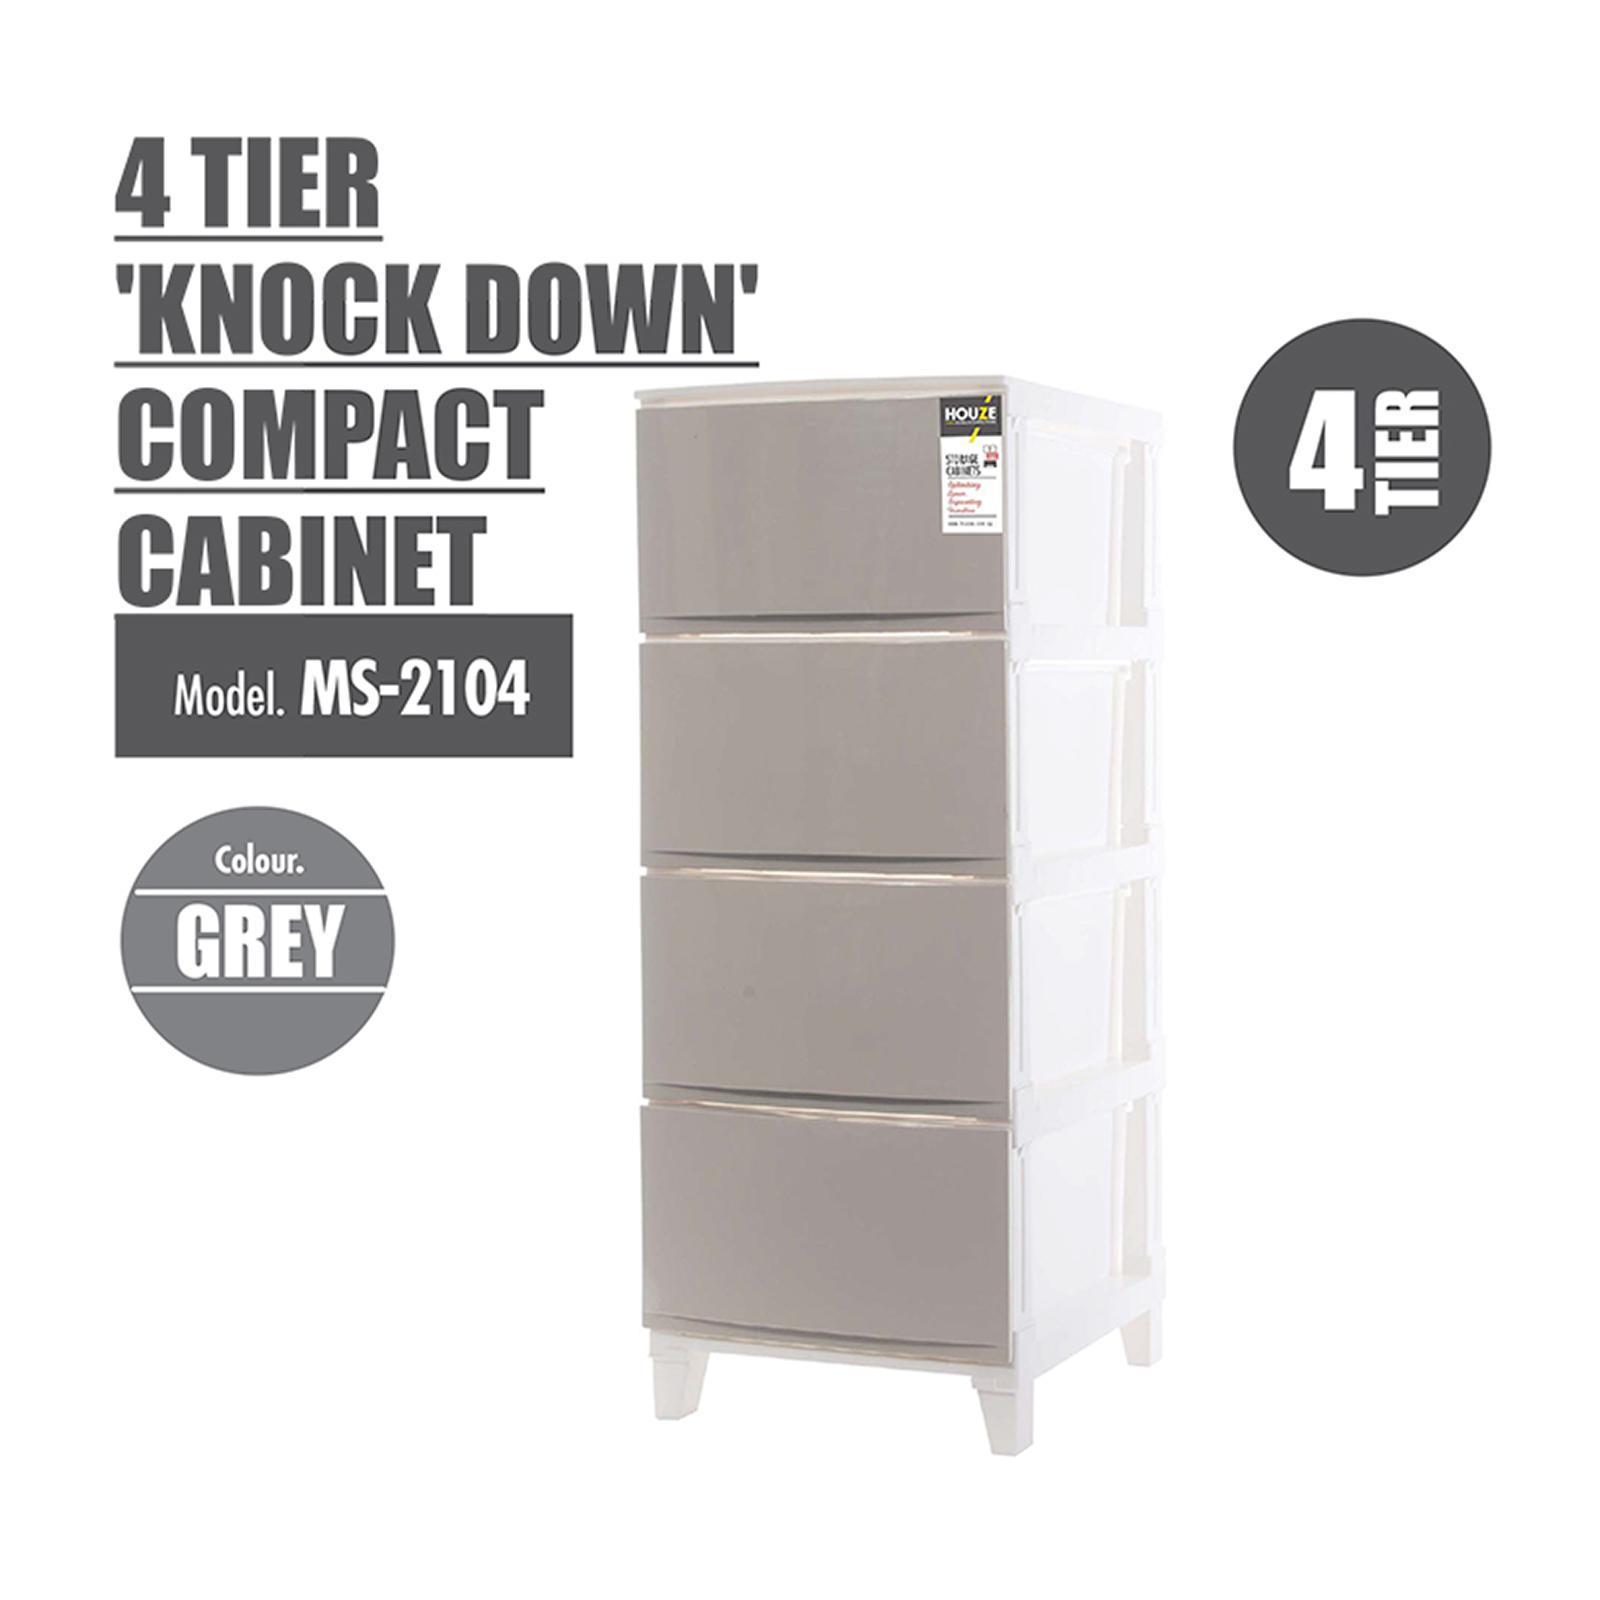 Houze 3 Tier 'Knock Down' Compact Cabinet - Grey - MS-2103-GREY